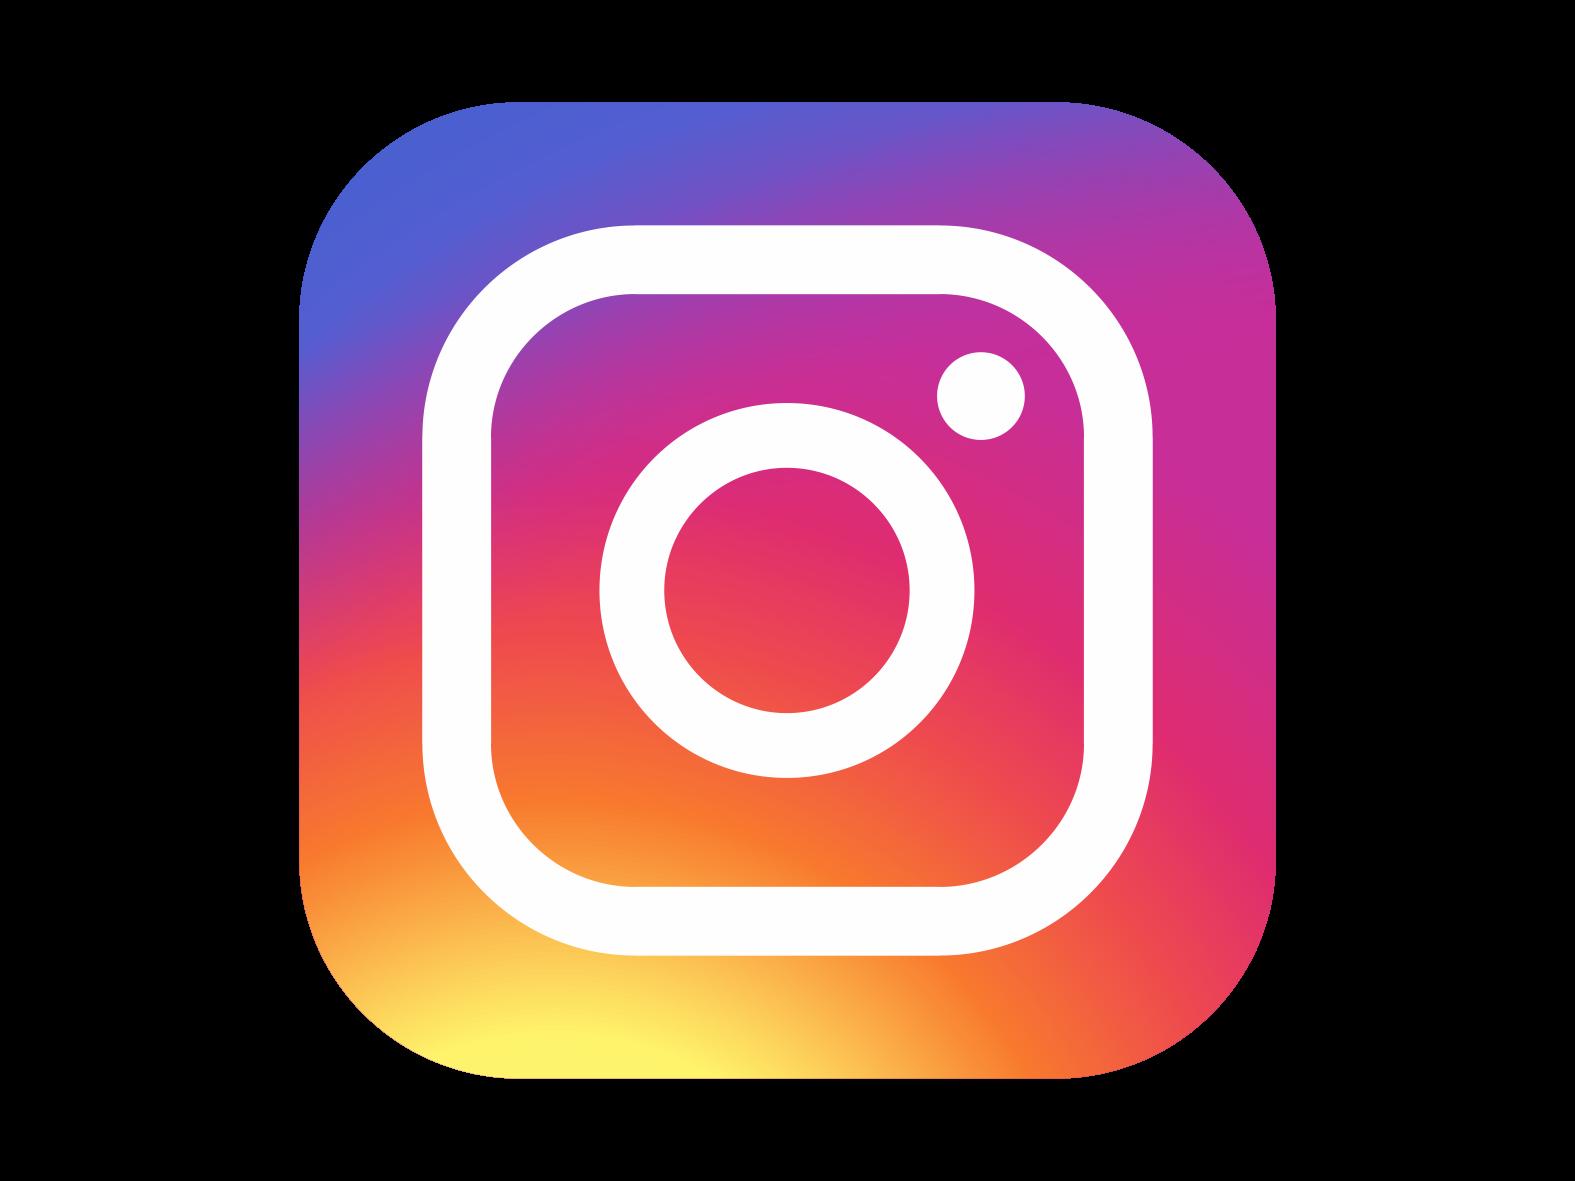 logo instagram vector cdr amp png hd gudril logo tempat